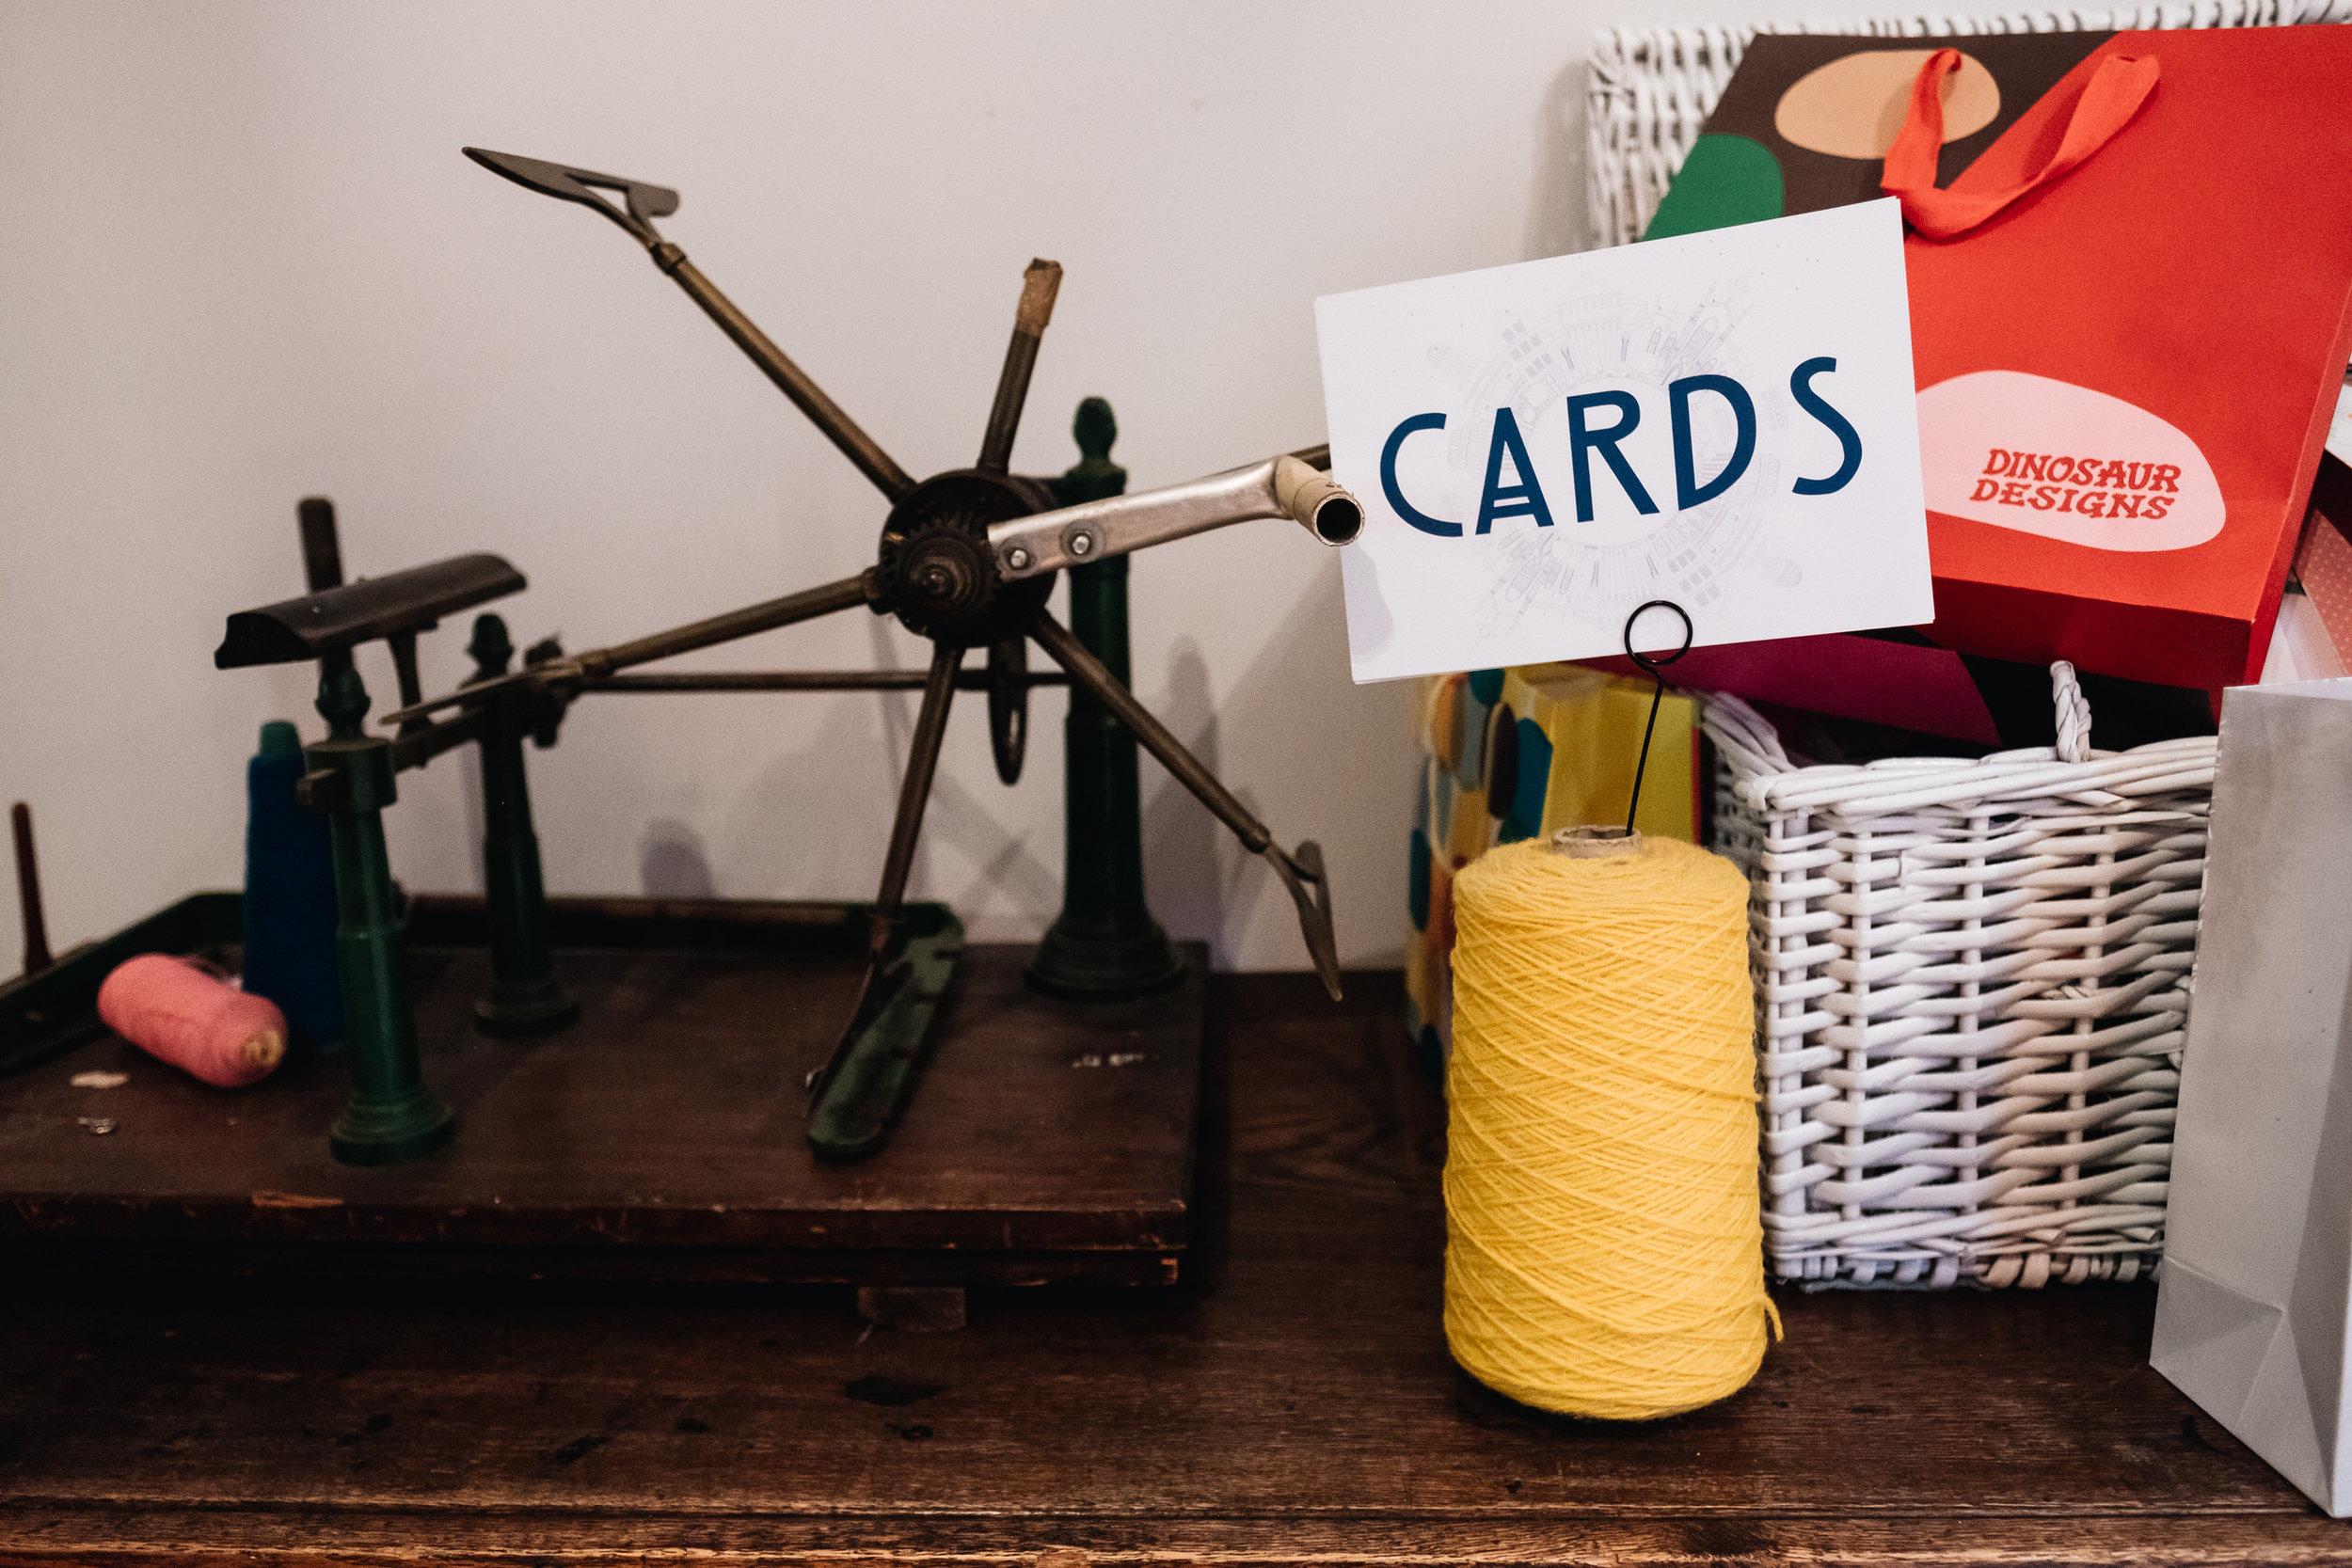 23 -Dovecot-Studios-Wedding-Edinburgh-cards.JPG